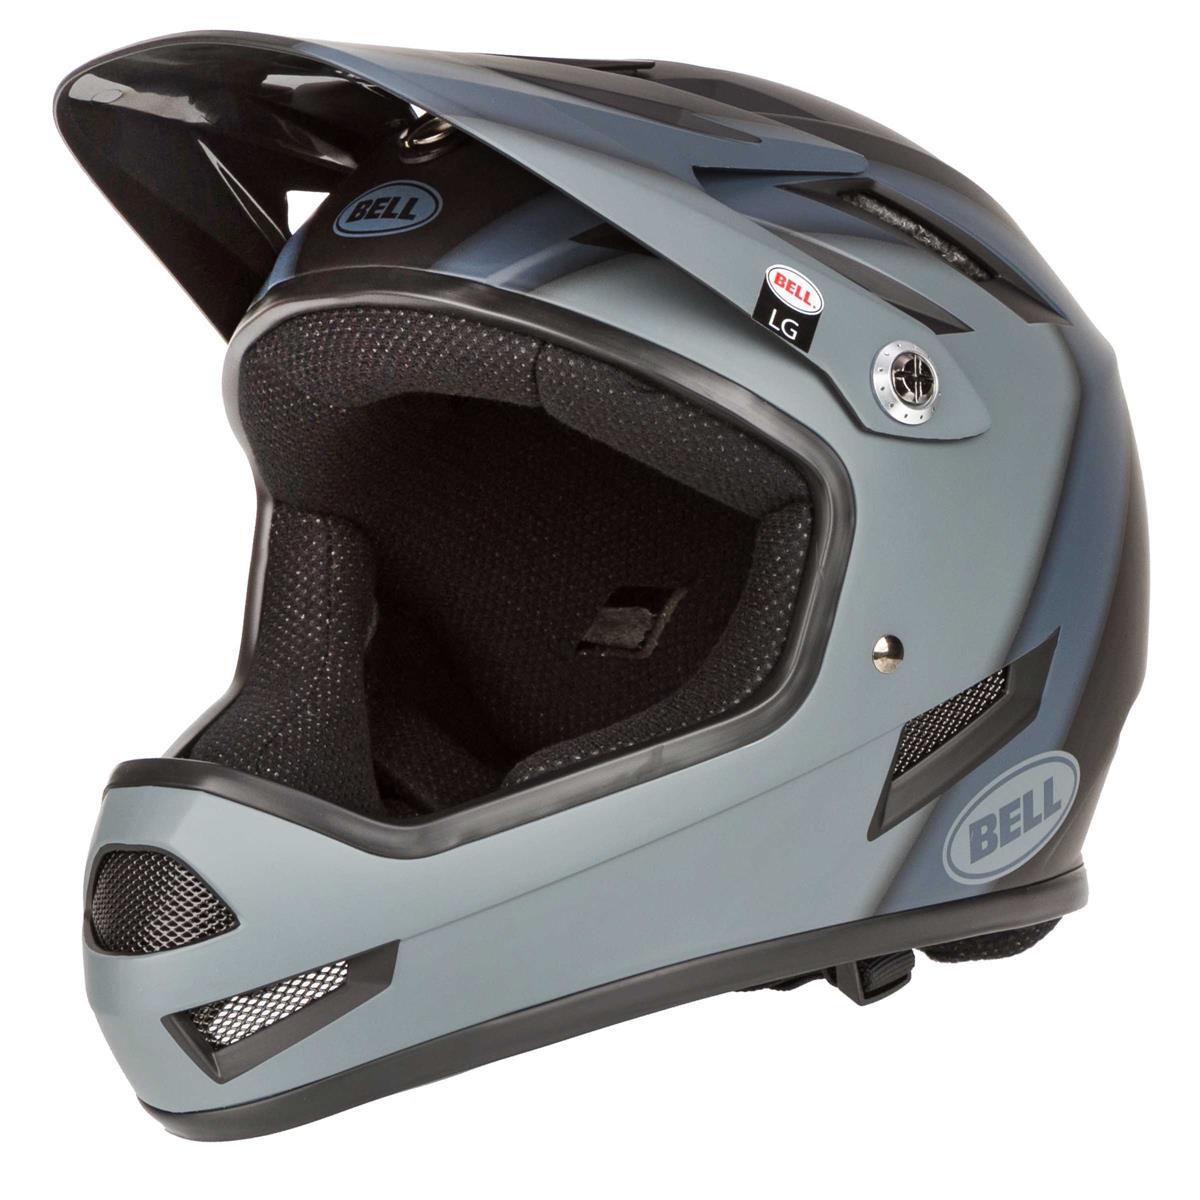 Bell Downhill-MTB Helm Sanction Matt Schwarz